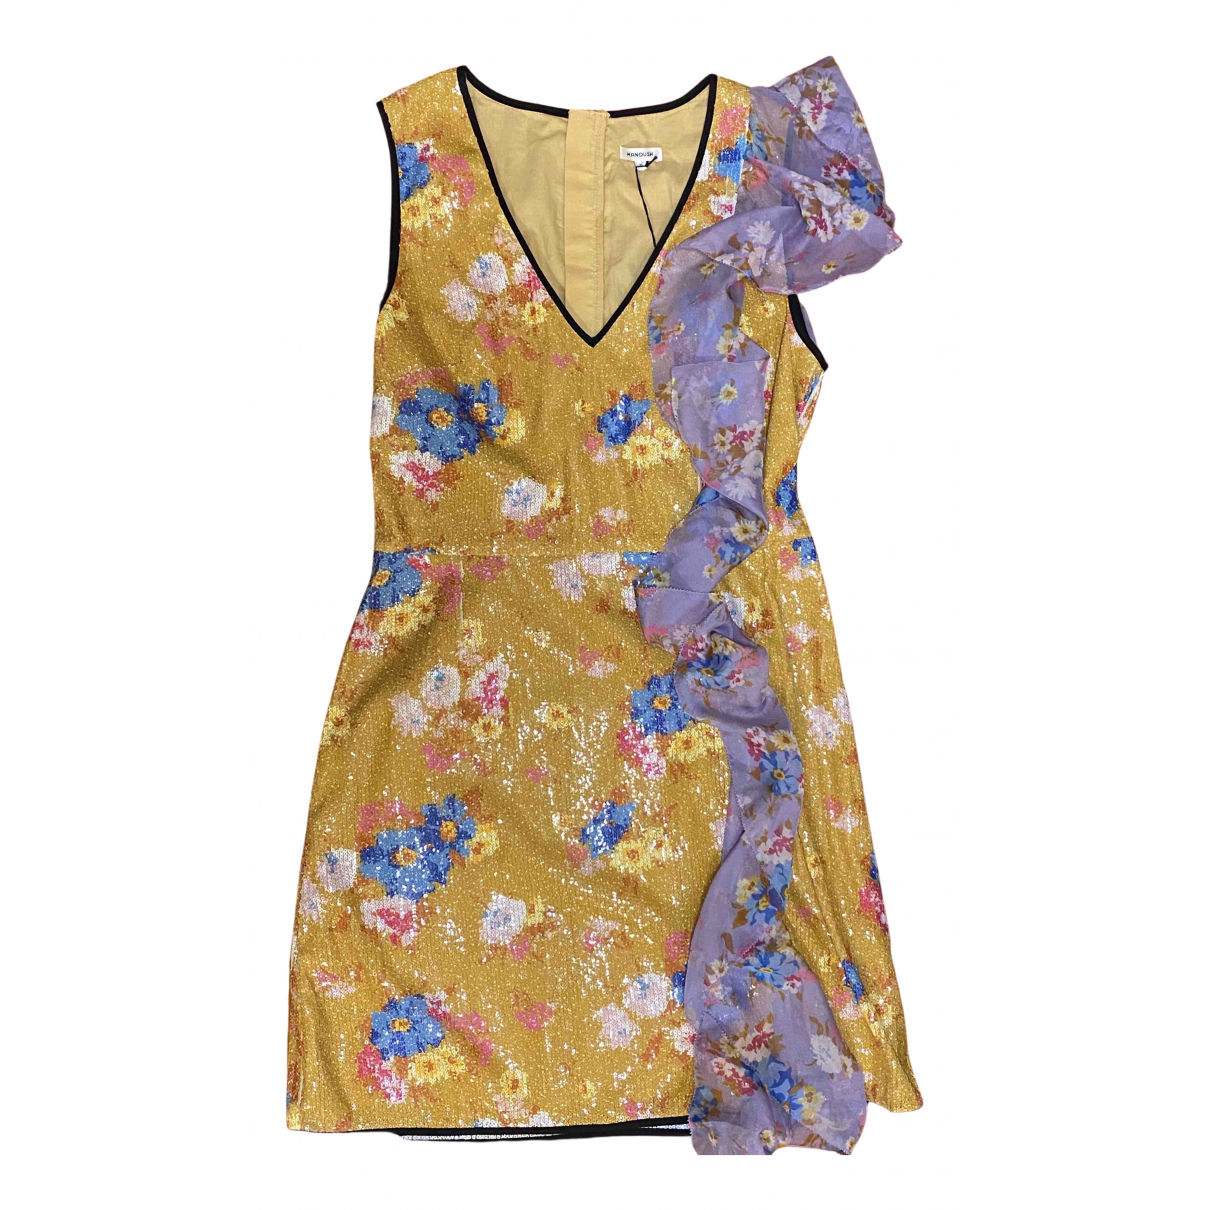 Manoush \N Kleid in  Gelb Polyester